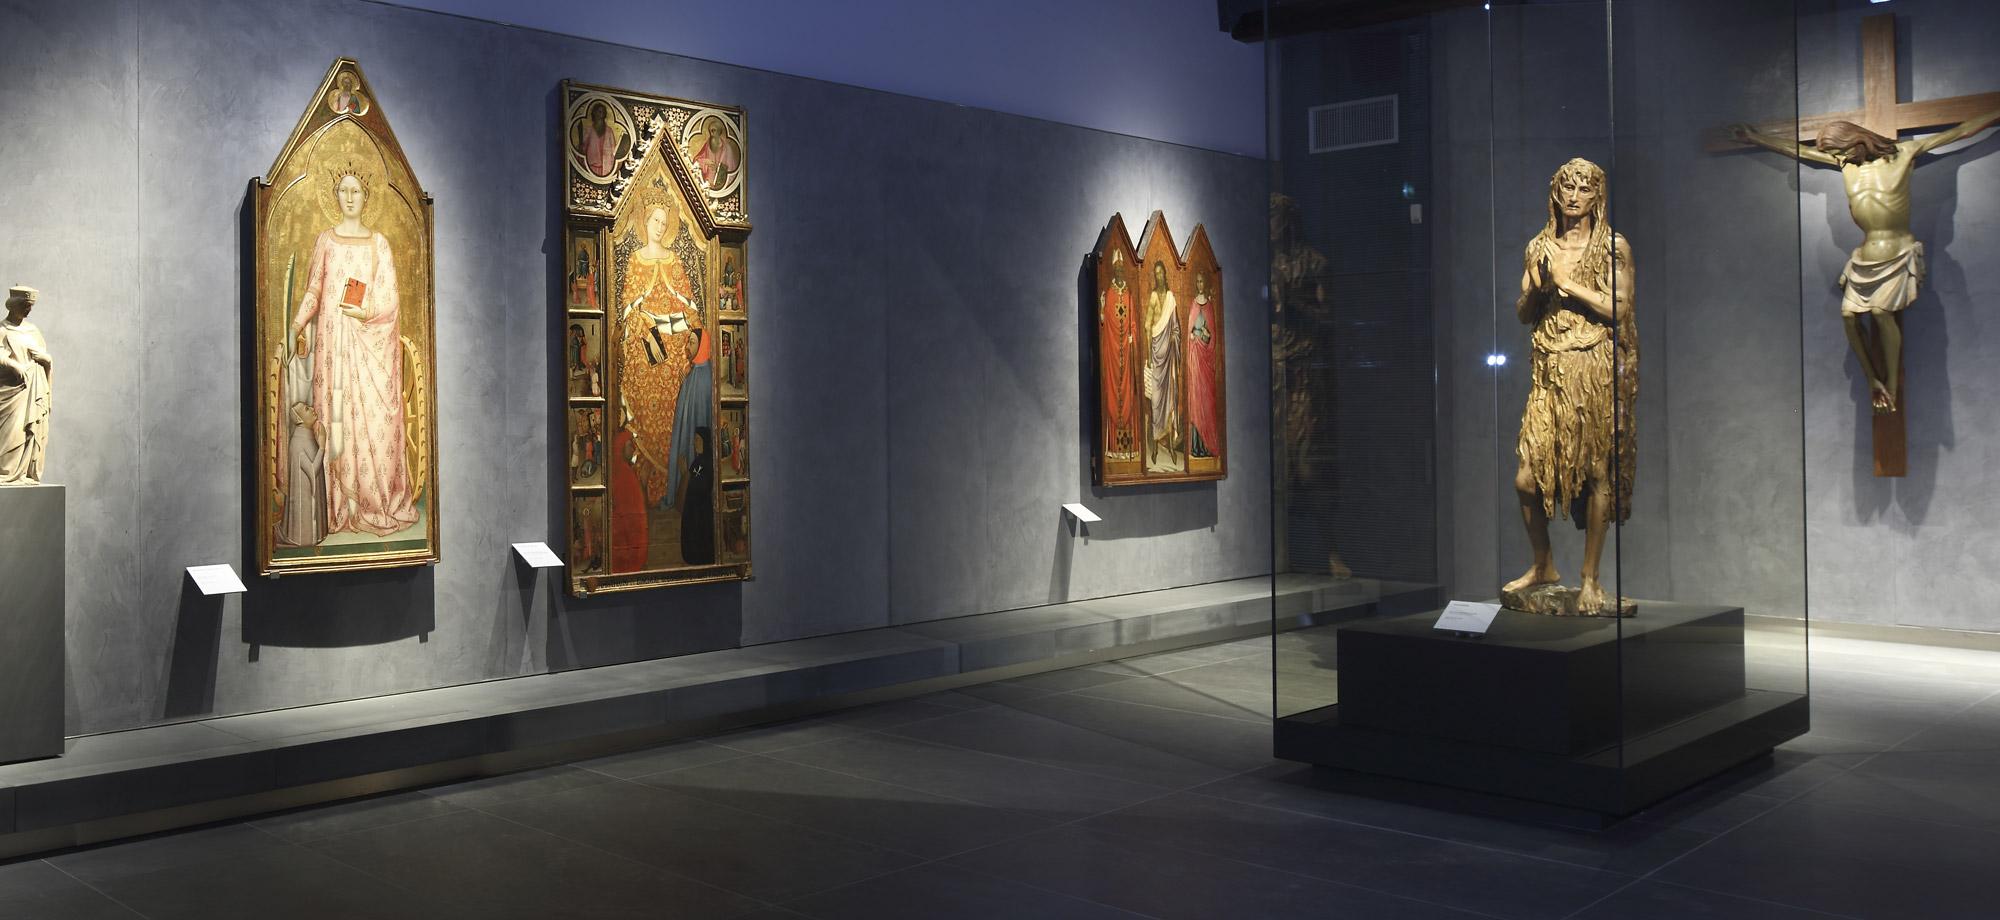 cmb-museo-opera-duomo-firenze-museum-florence